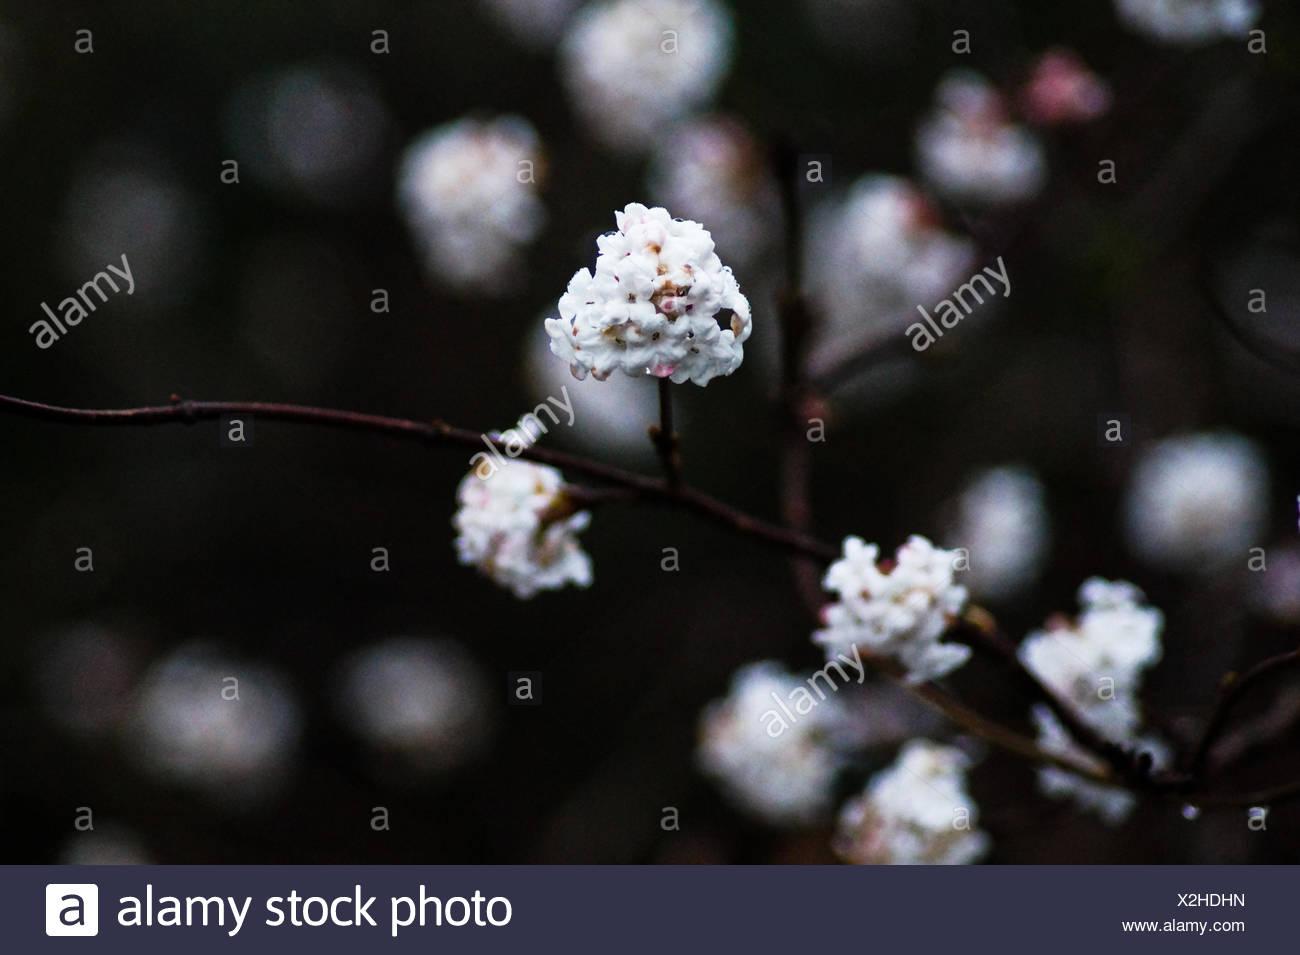 Tiny white flowers stock photos tiny white flowers stock images close up of tiny white flowers blooming outdoors stock image mightylinksfo